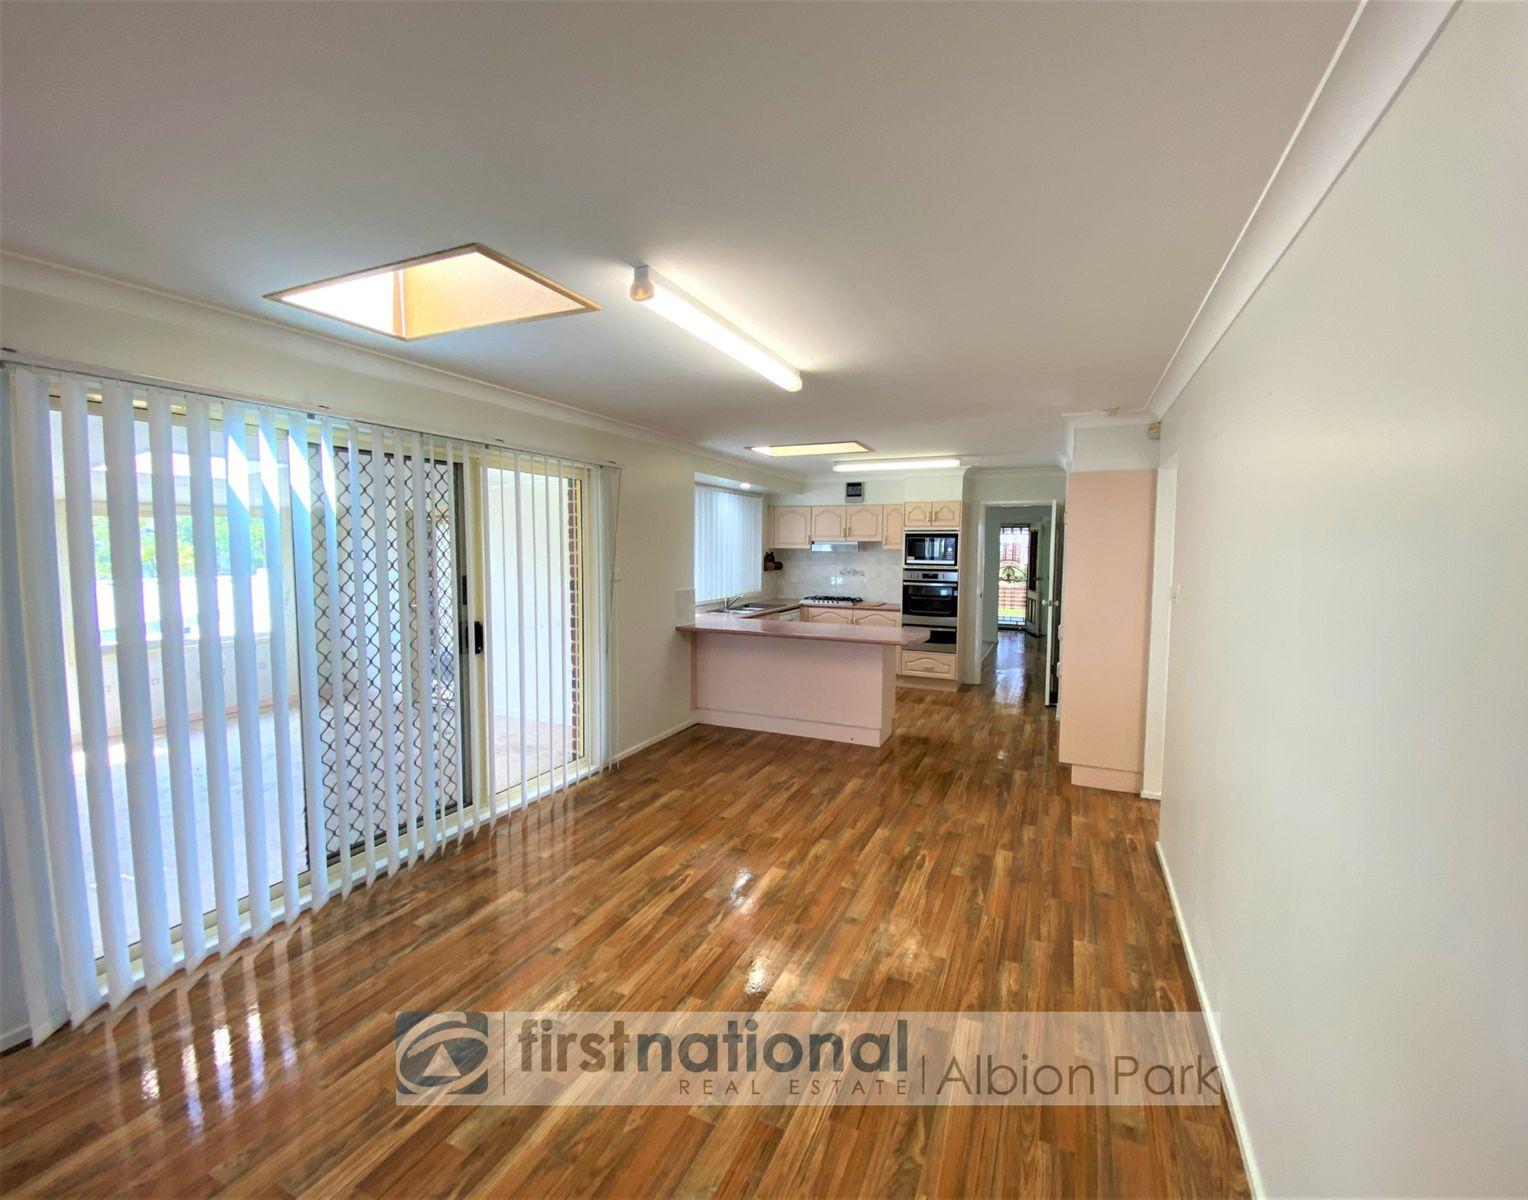 55 Daintree Drive, Albion Park, NSW 2527